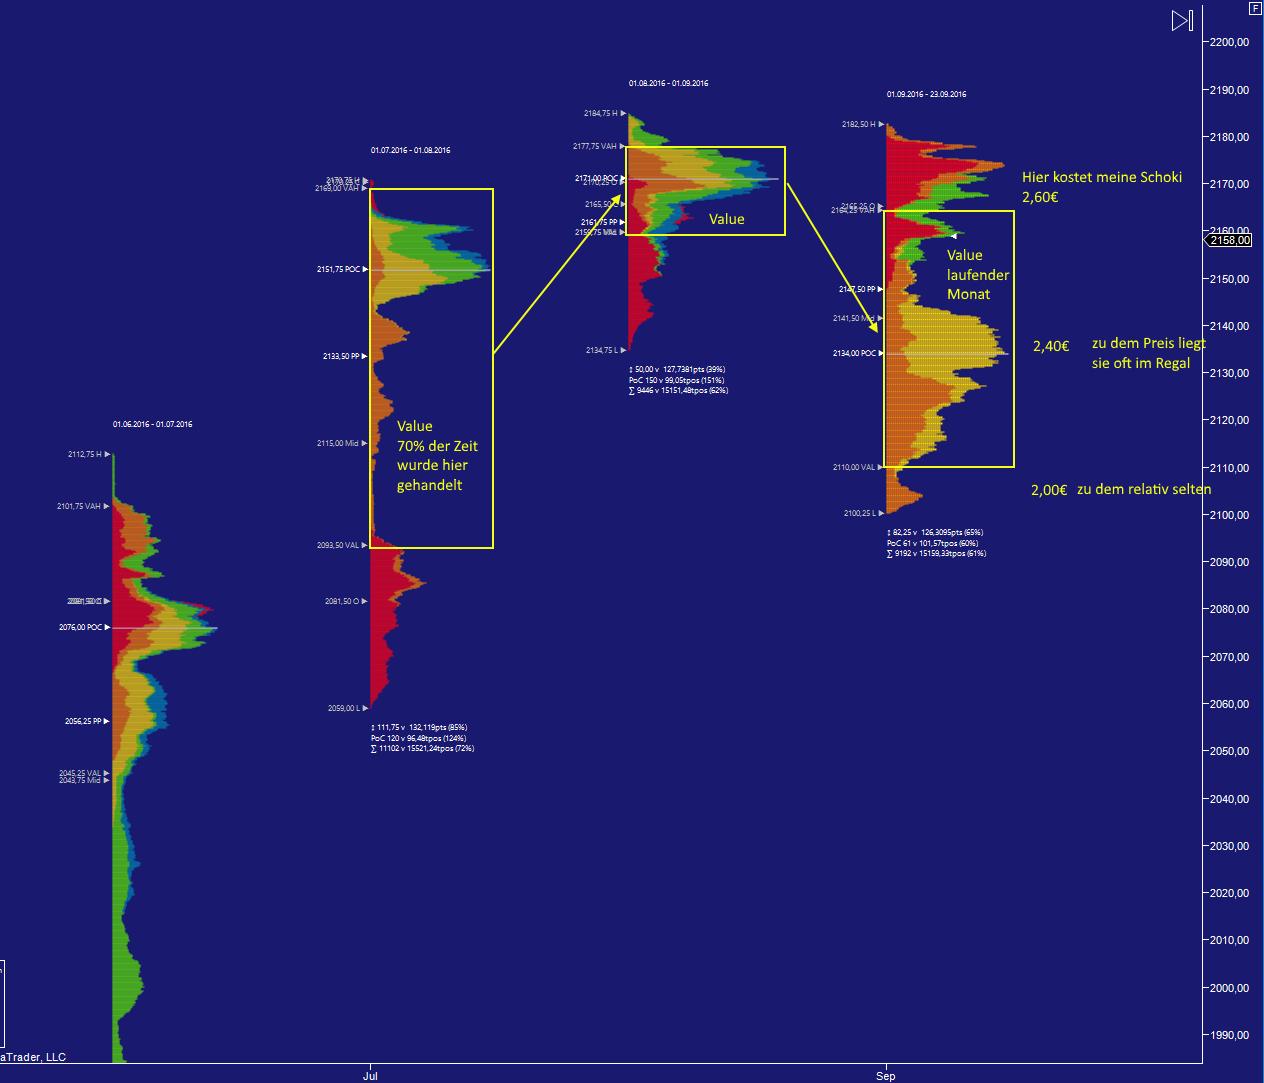 spx2 - Marktprofil im Trading